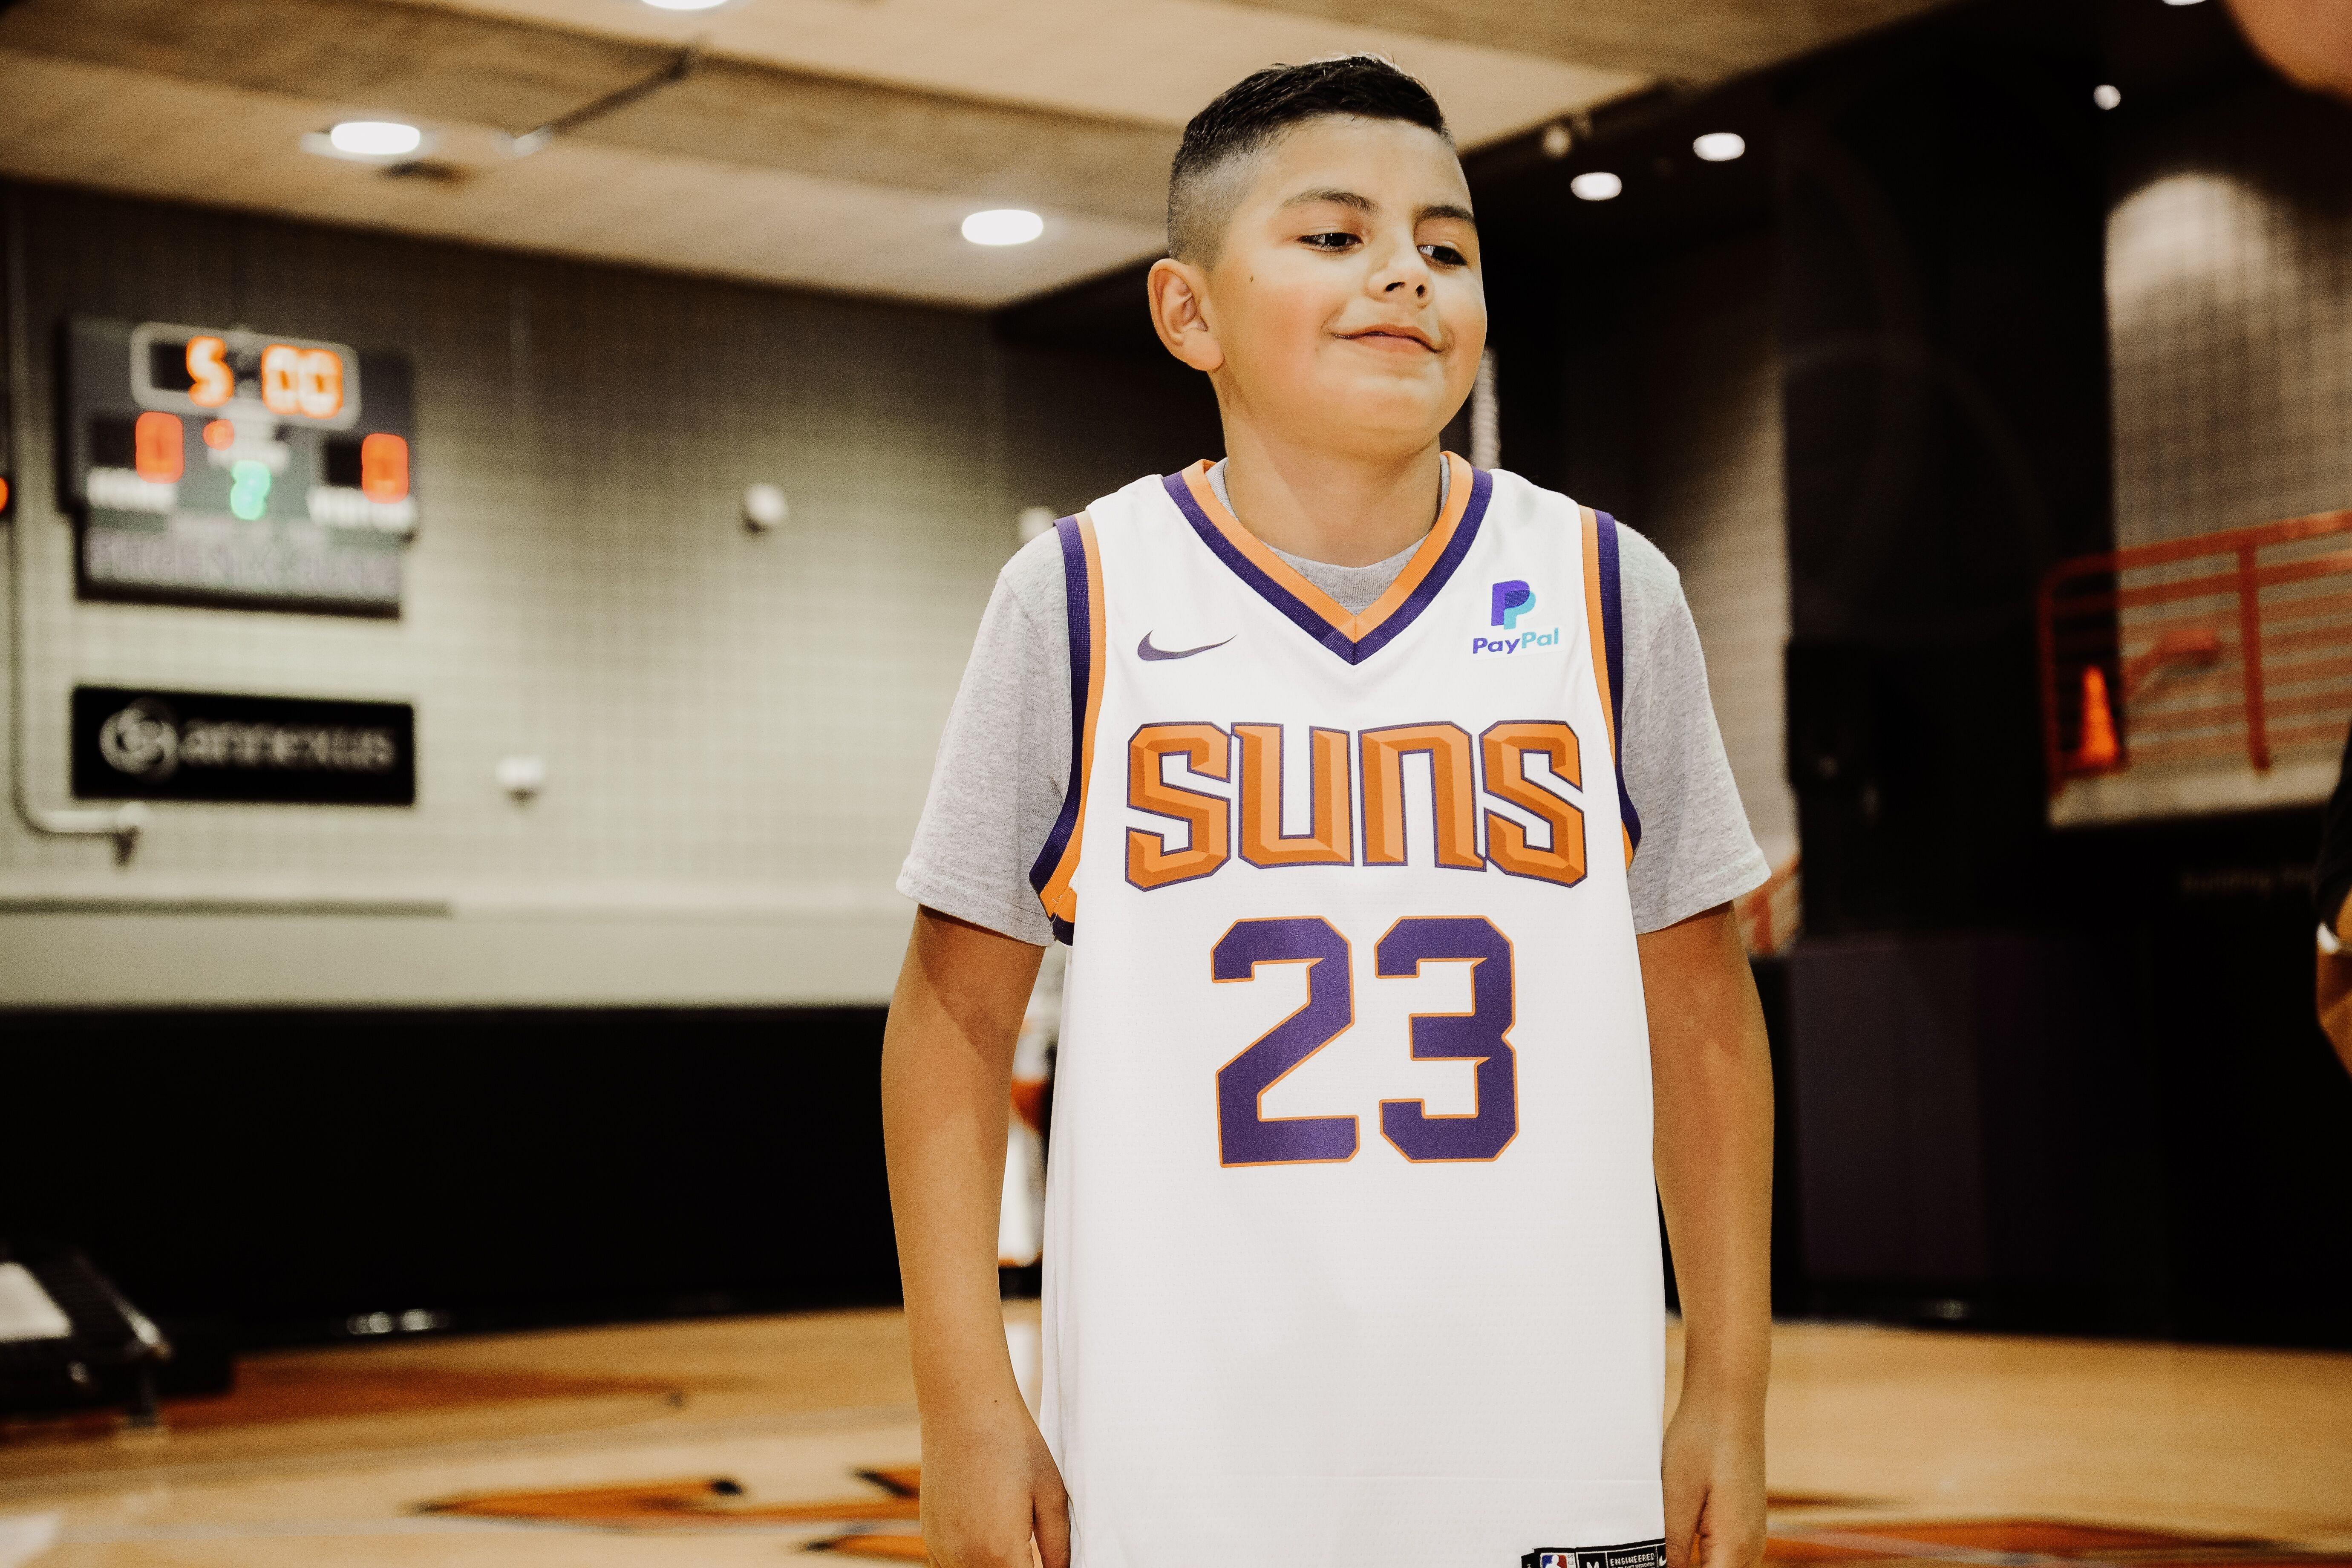 81b9472d90c9 Part 1  Phoenix Suns center Deandre Ayton surprises fan with invite to NBA  Draft Lottery